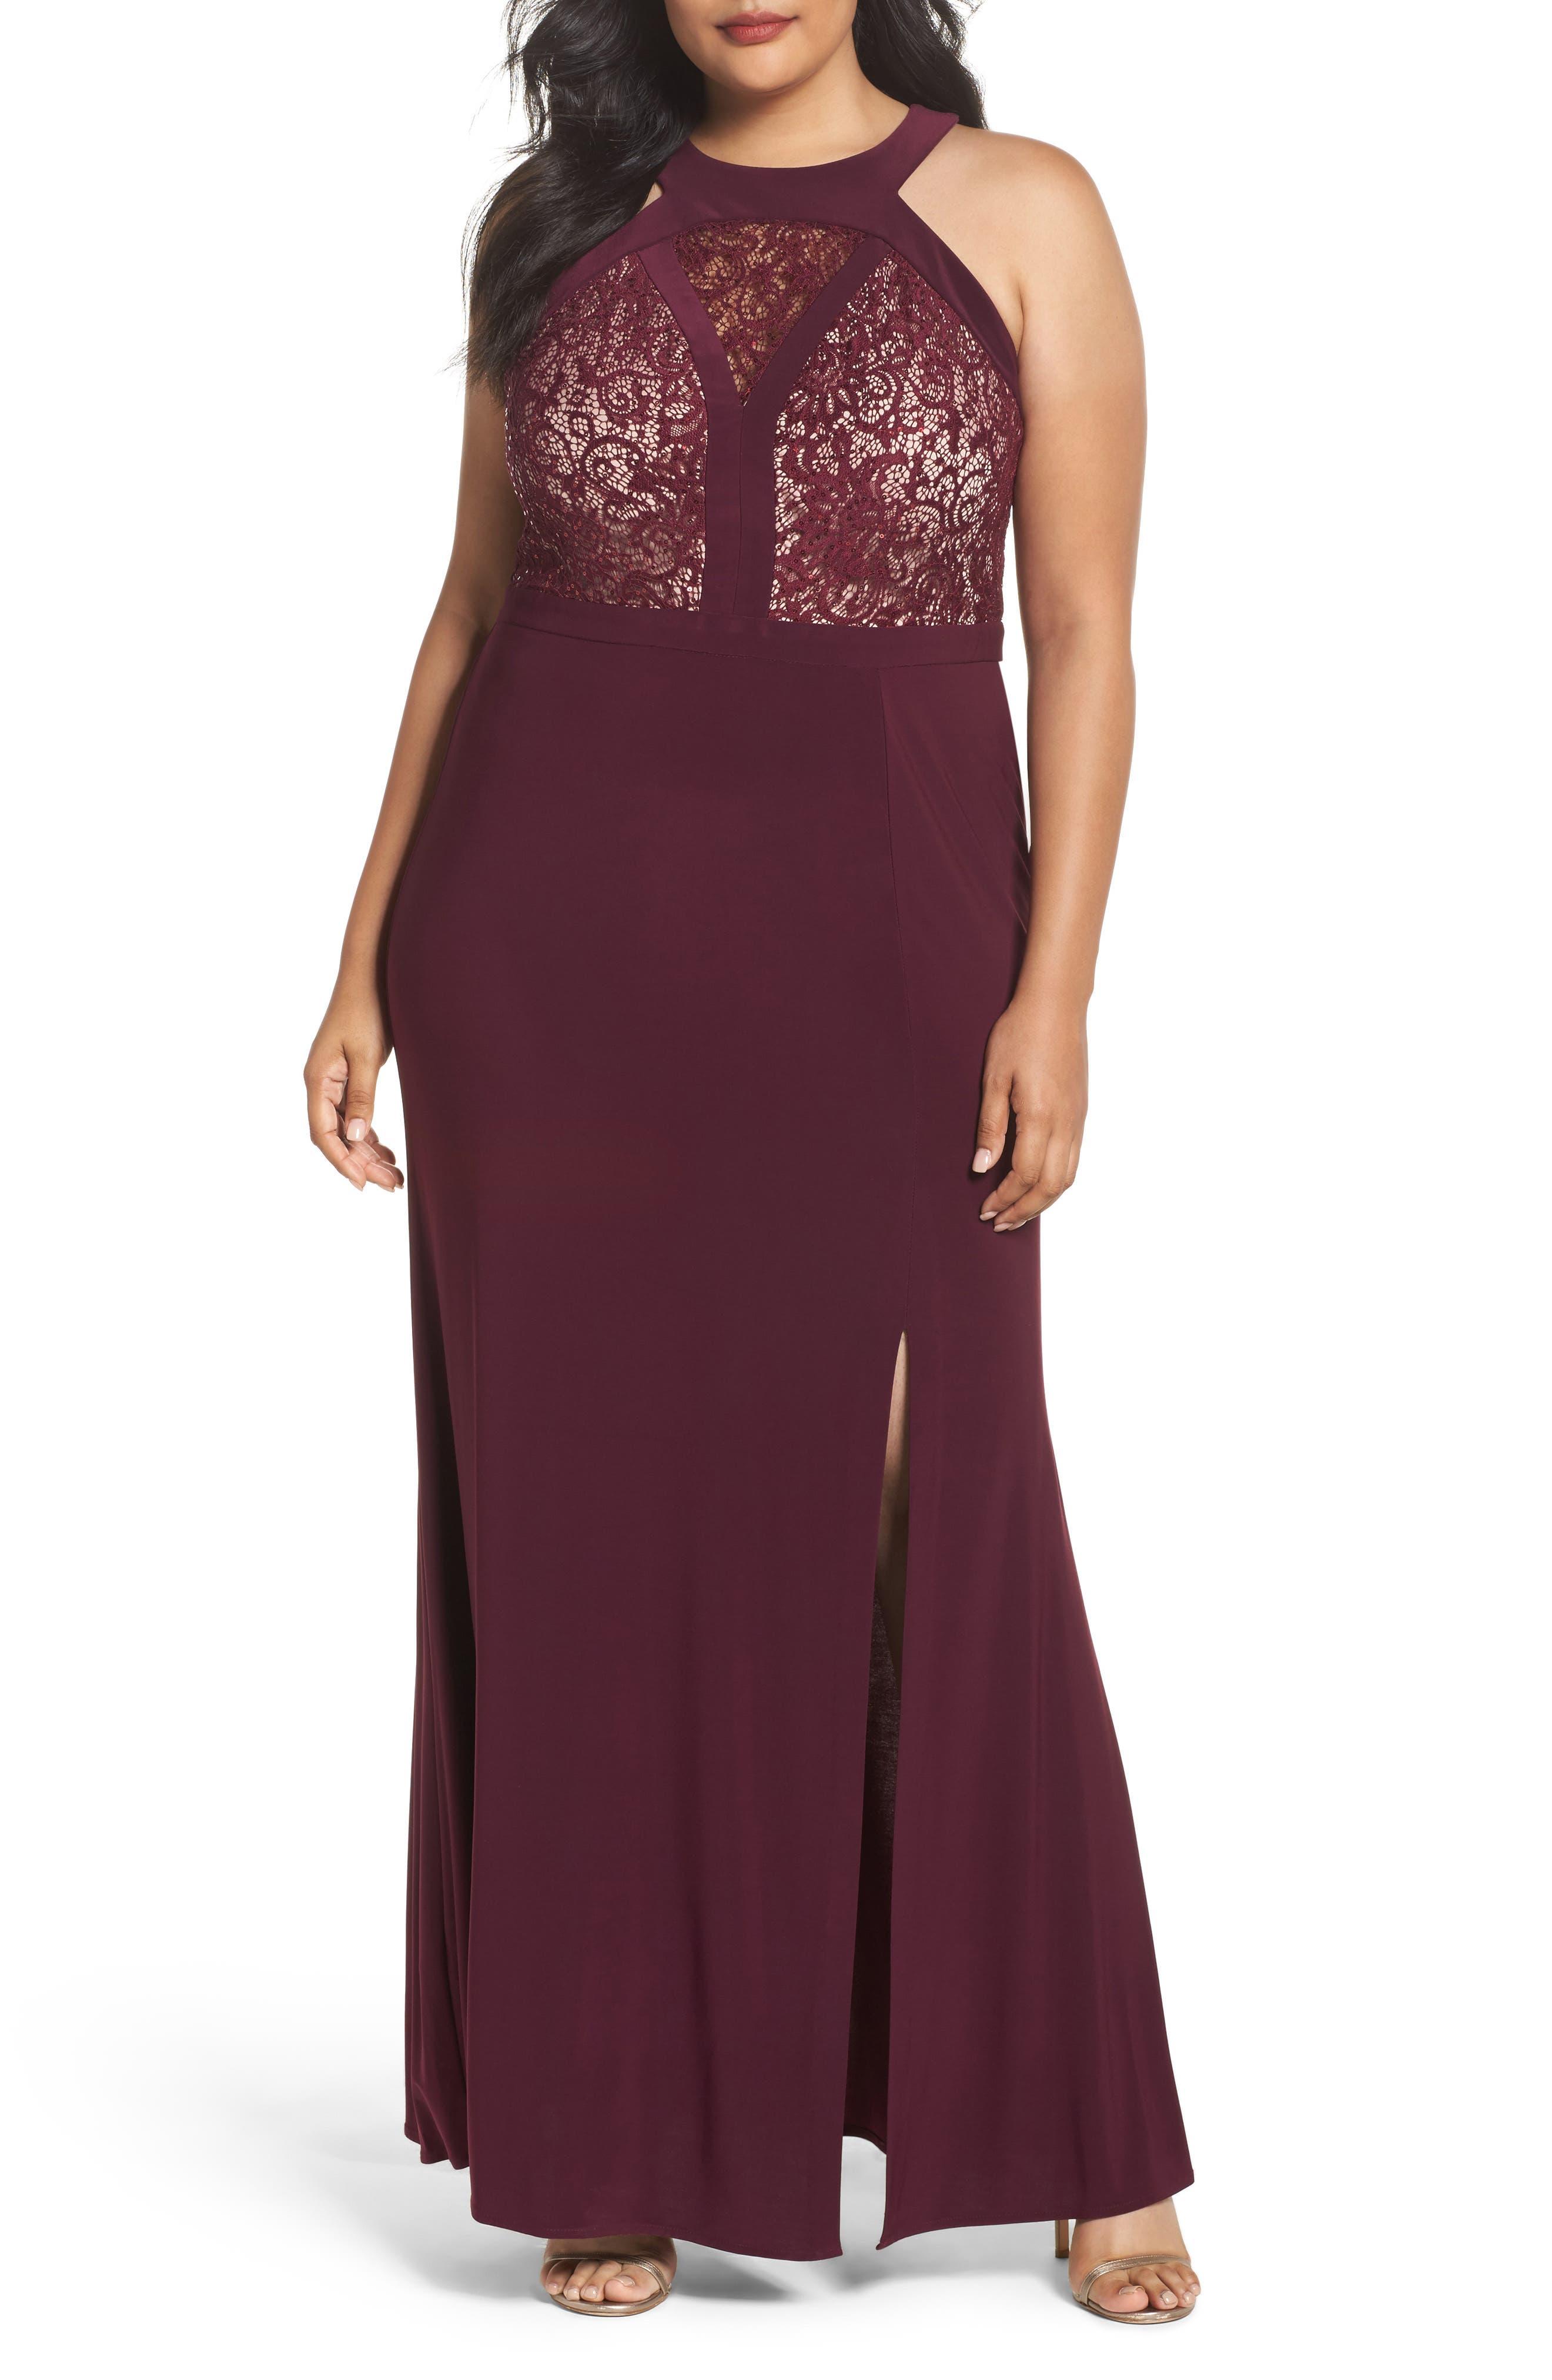 Lace Bodice Dress,                             Main thumbnail 1, color,                             Merlot/ Nude